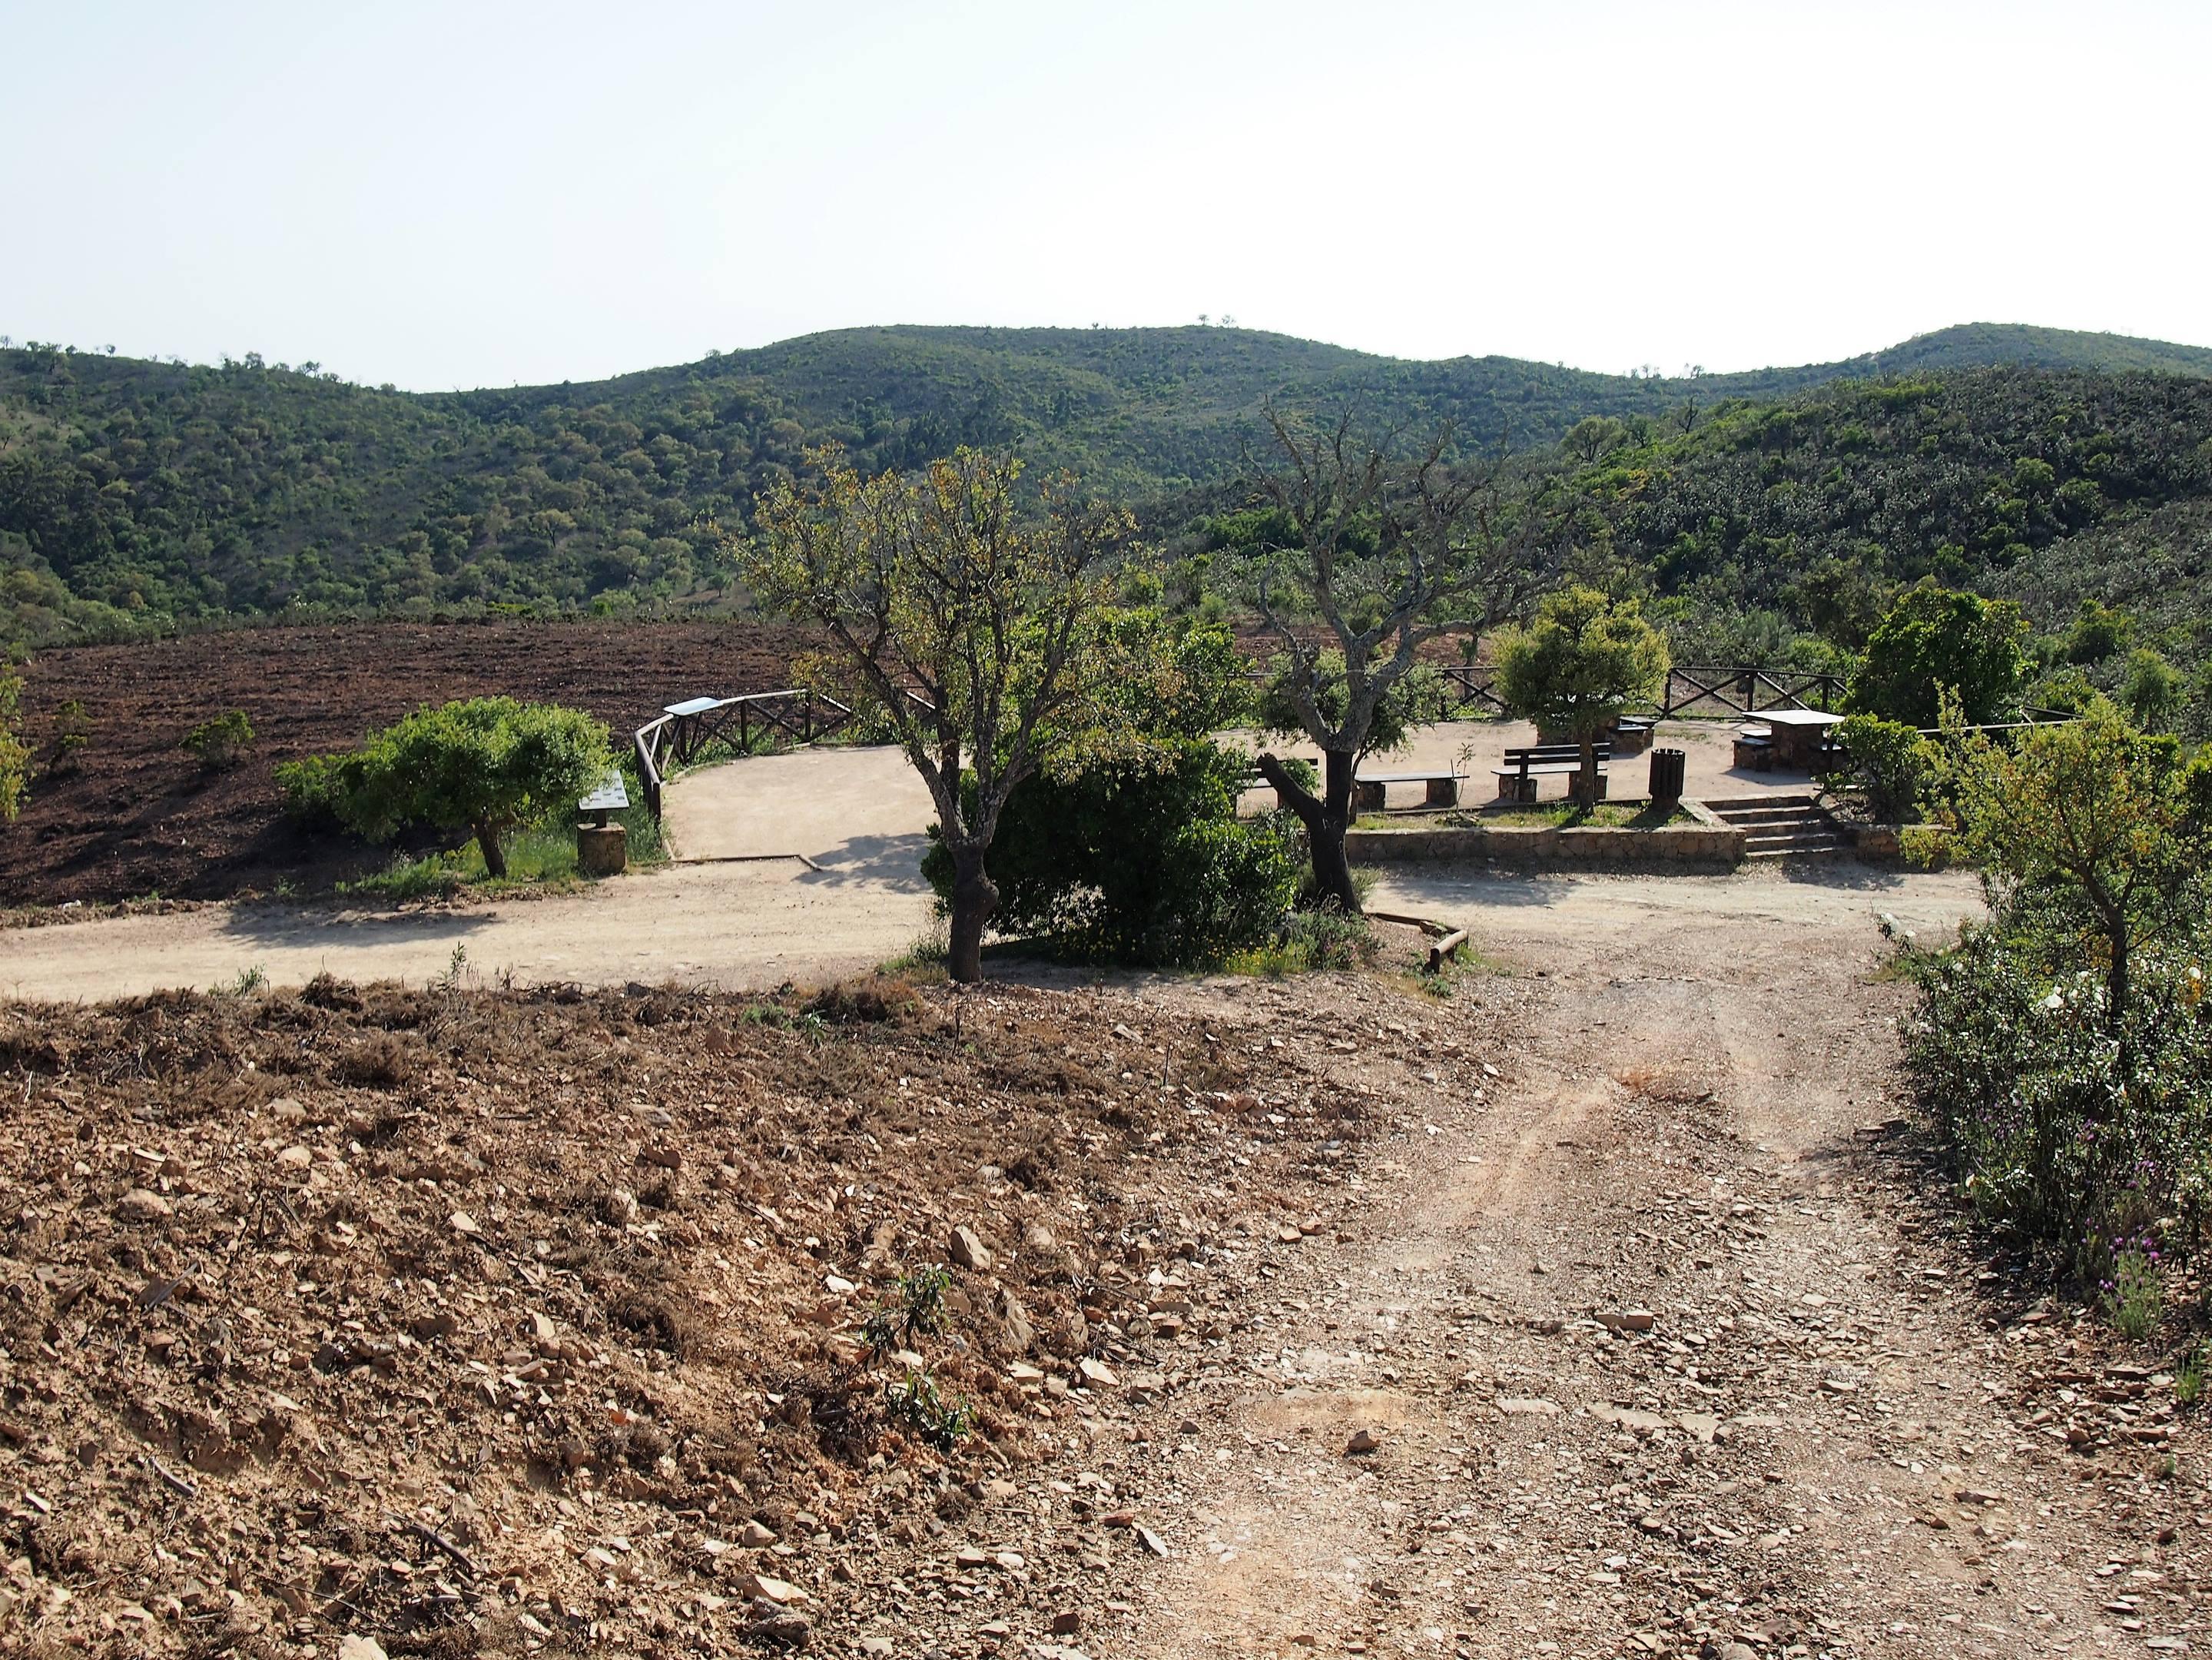 Disfruta del paisaje en este fantástico mirador, Miradouro do Alto da Ameixeira, en las colinas de Serra do Caldeirão cerca de São Brás de Alportel.